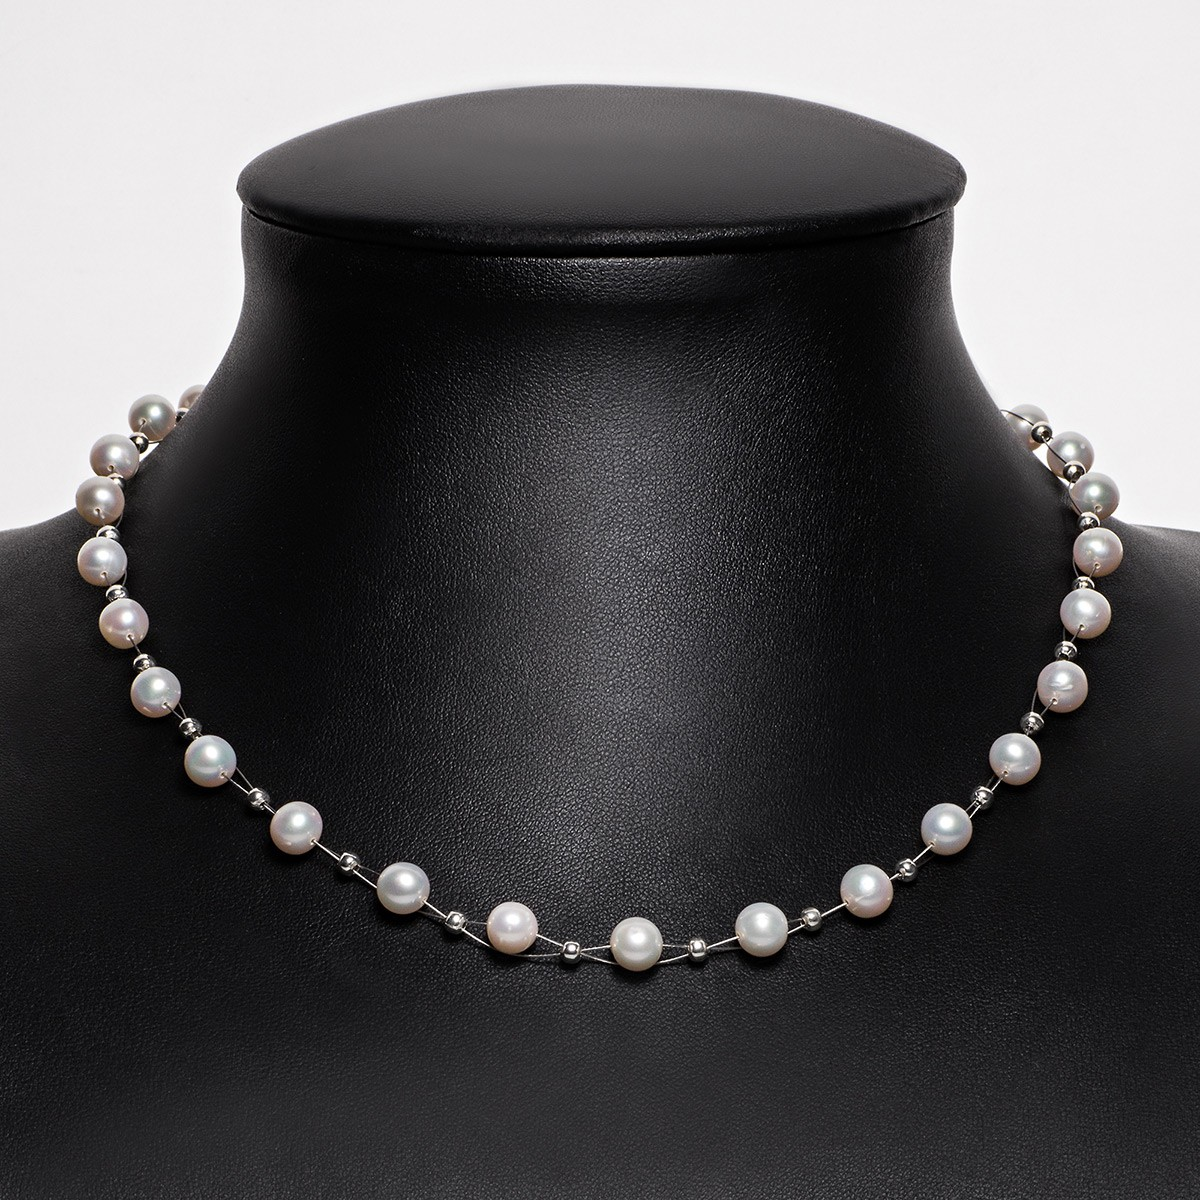 perlenkette kette collier halskette echte perlen creme wei halsschmuck damen kategorien. Black Bedroom Furniture Sets. Home Design Ideas